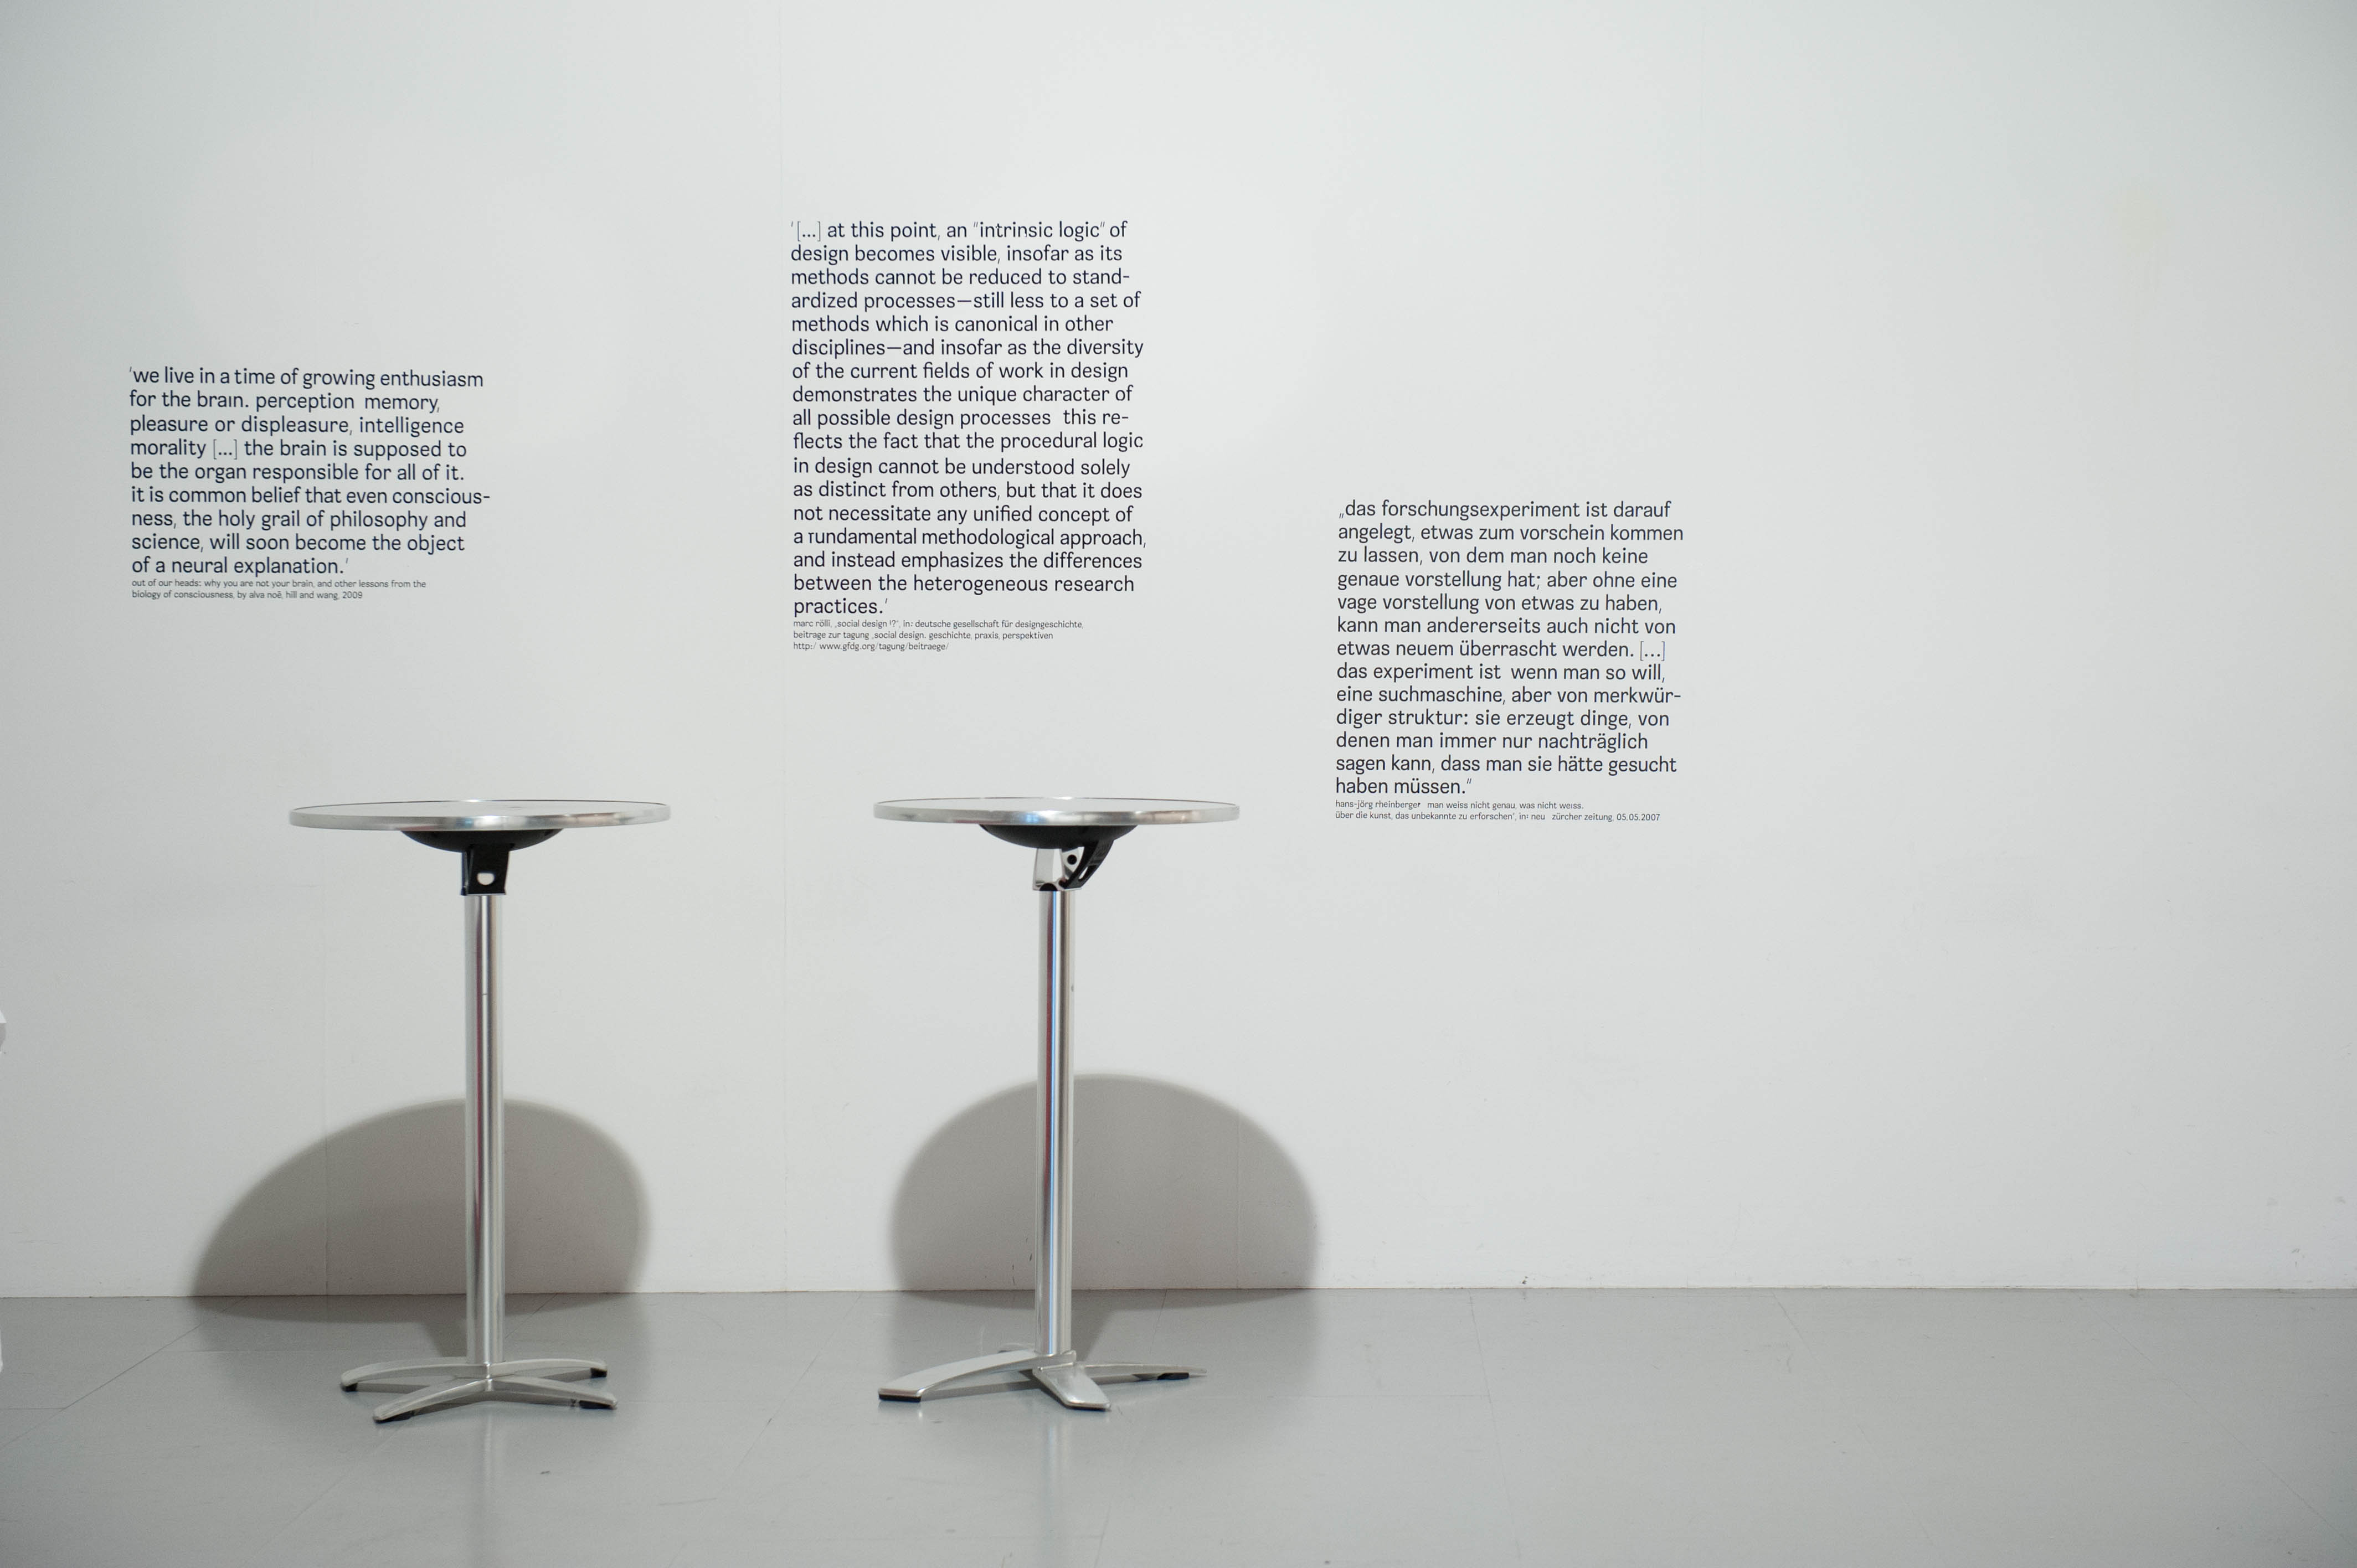 Eigenlogik des designs / the intrinsic logic of design